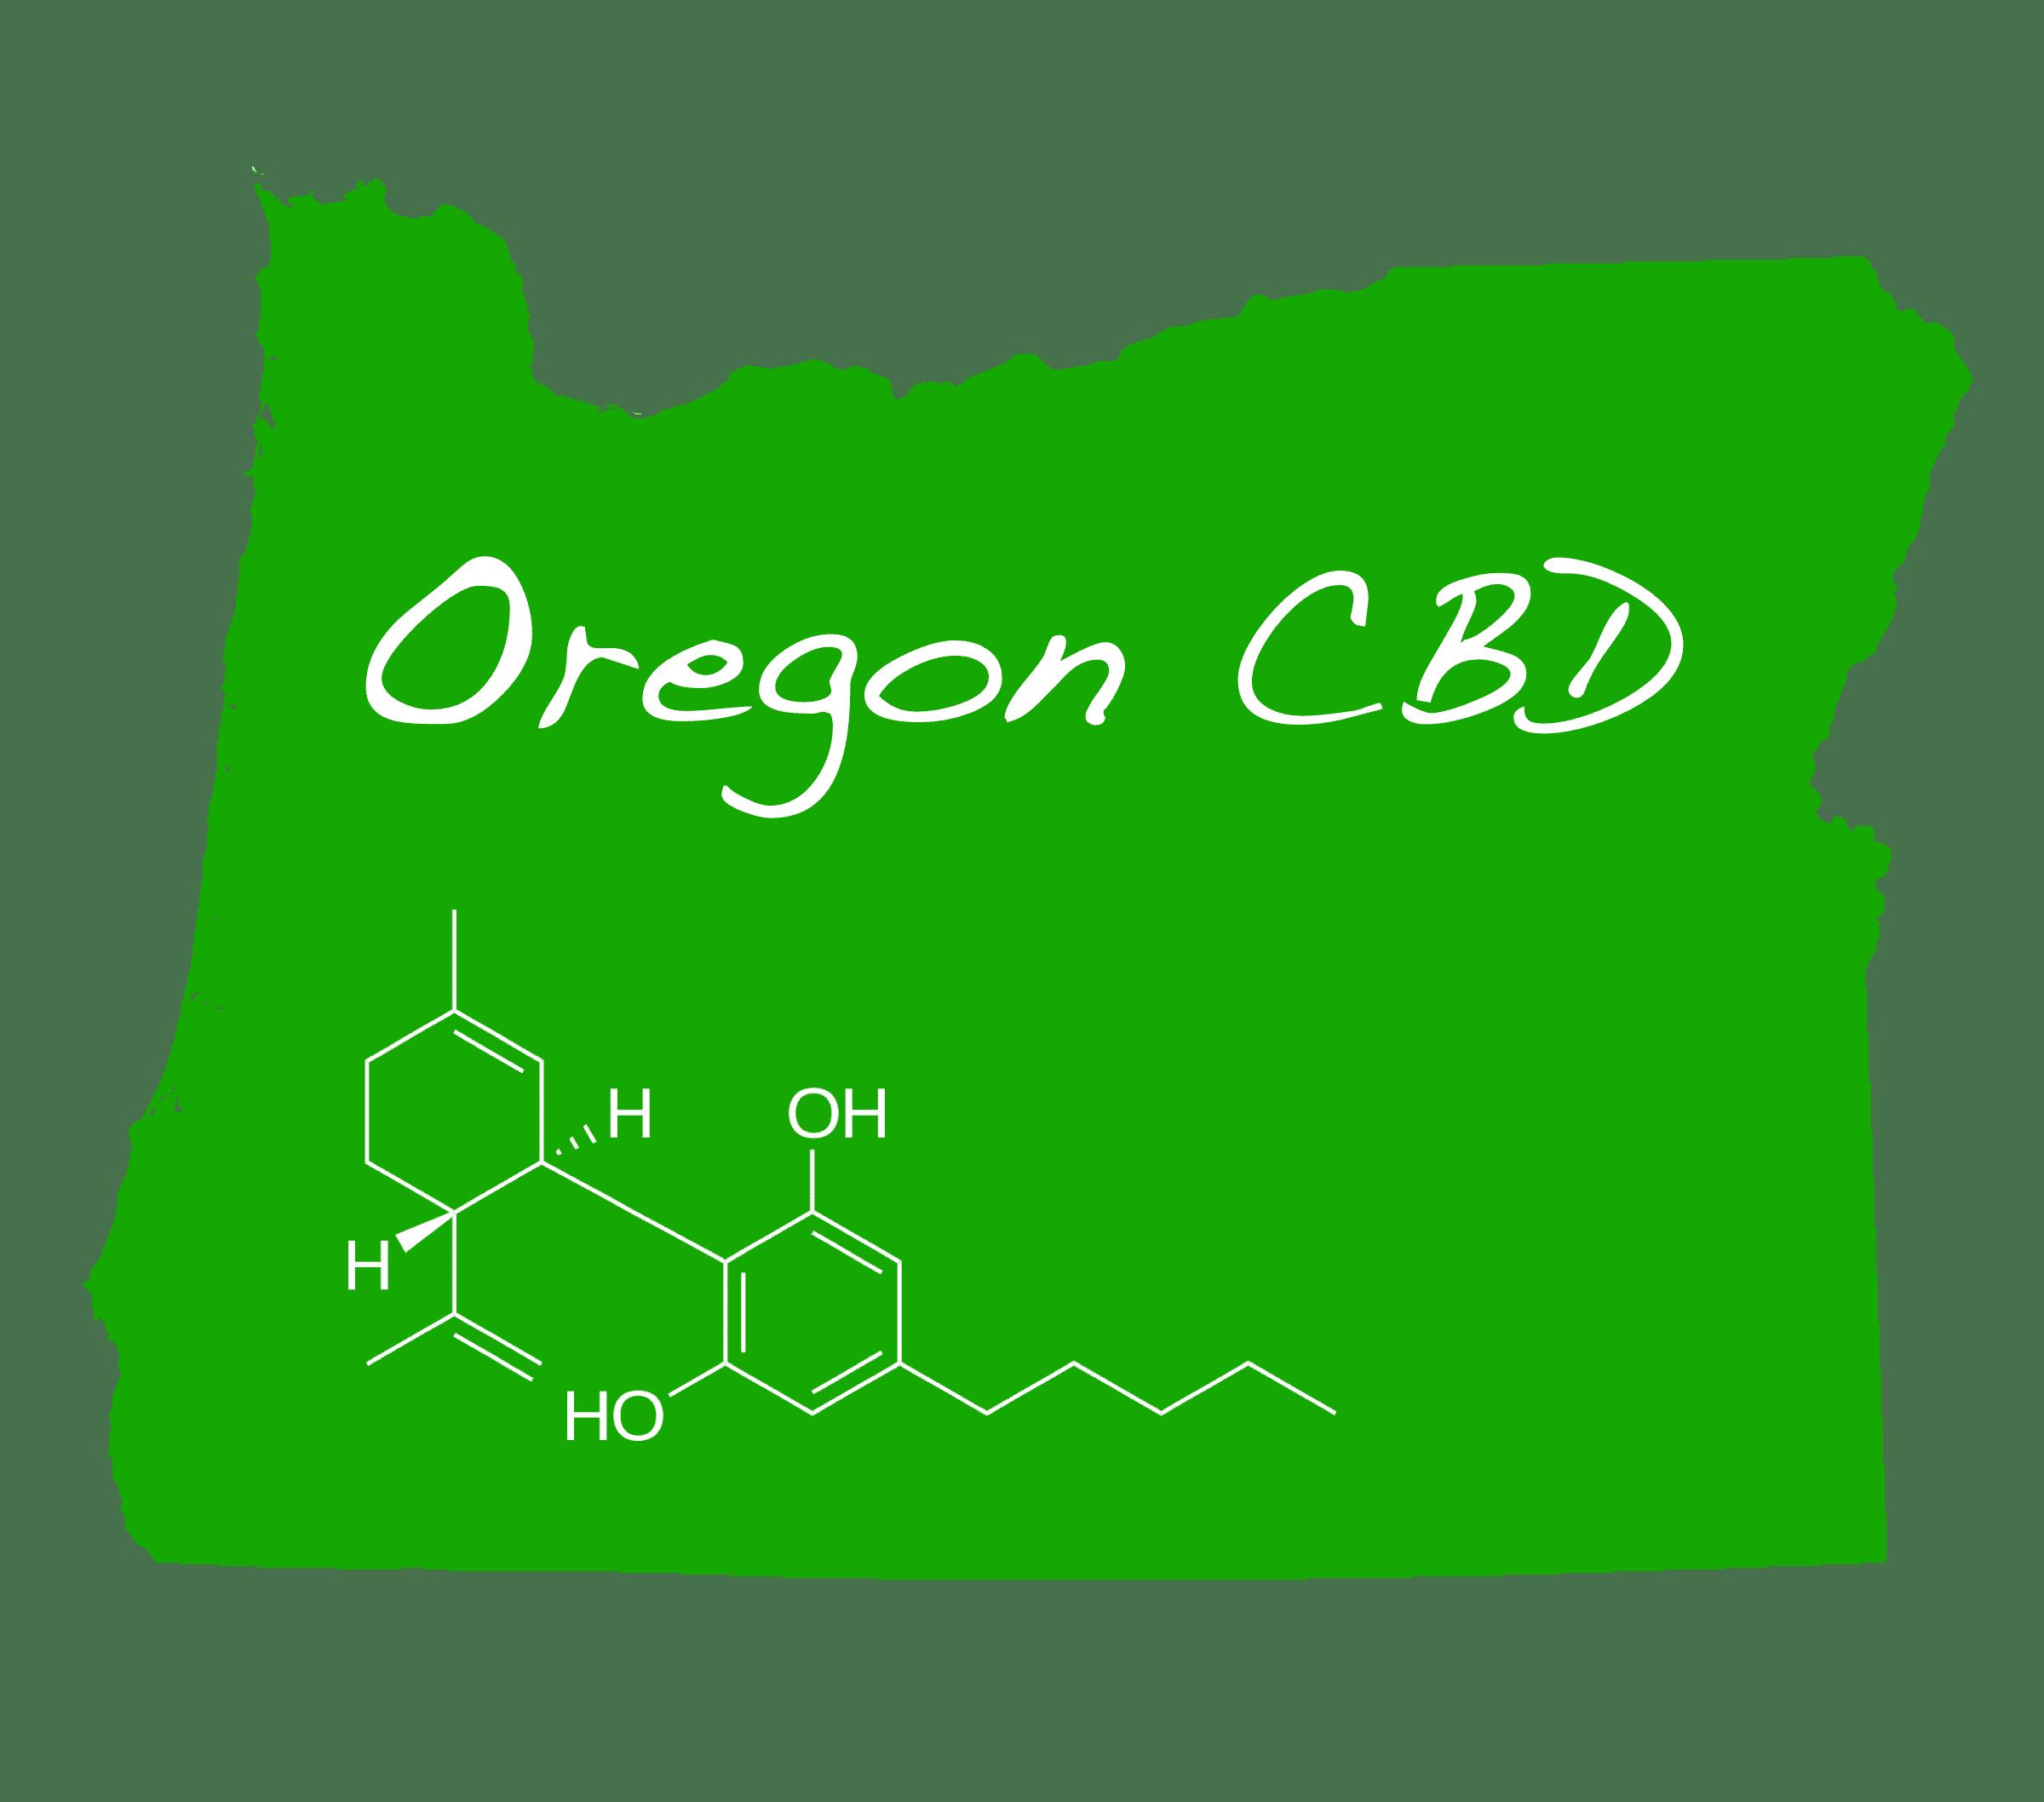 News | Oregon CBD | The Trusted Source for Feminized Hemp Seed